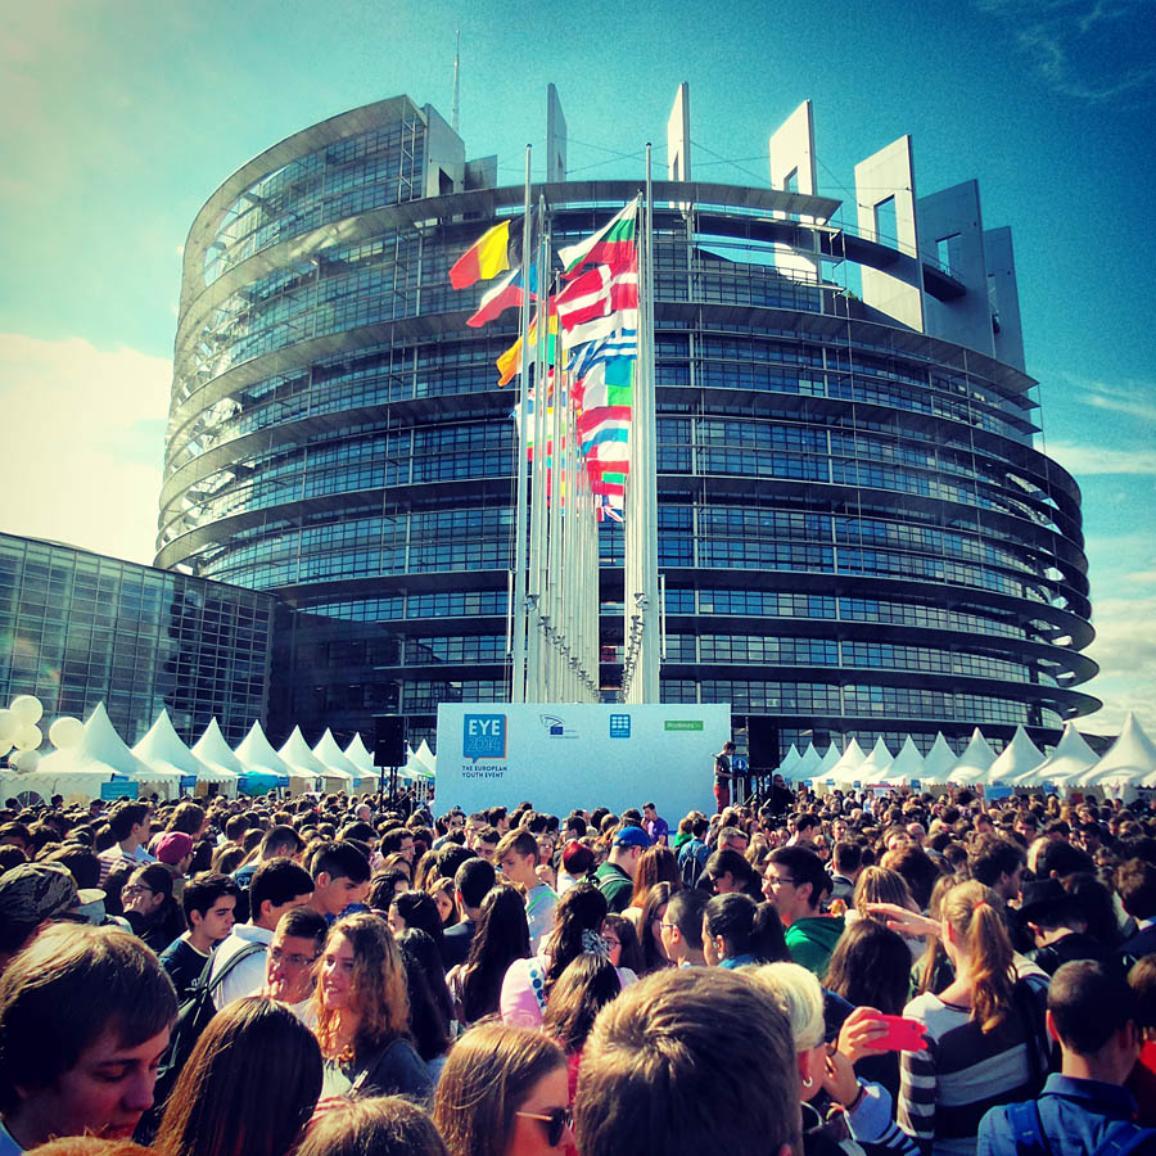 EYE 2014 opening ceremony in Strasbourg